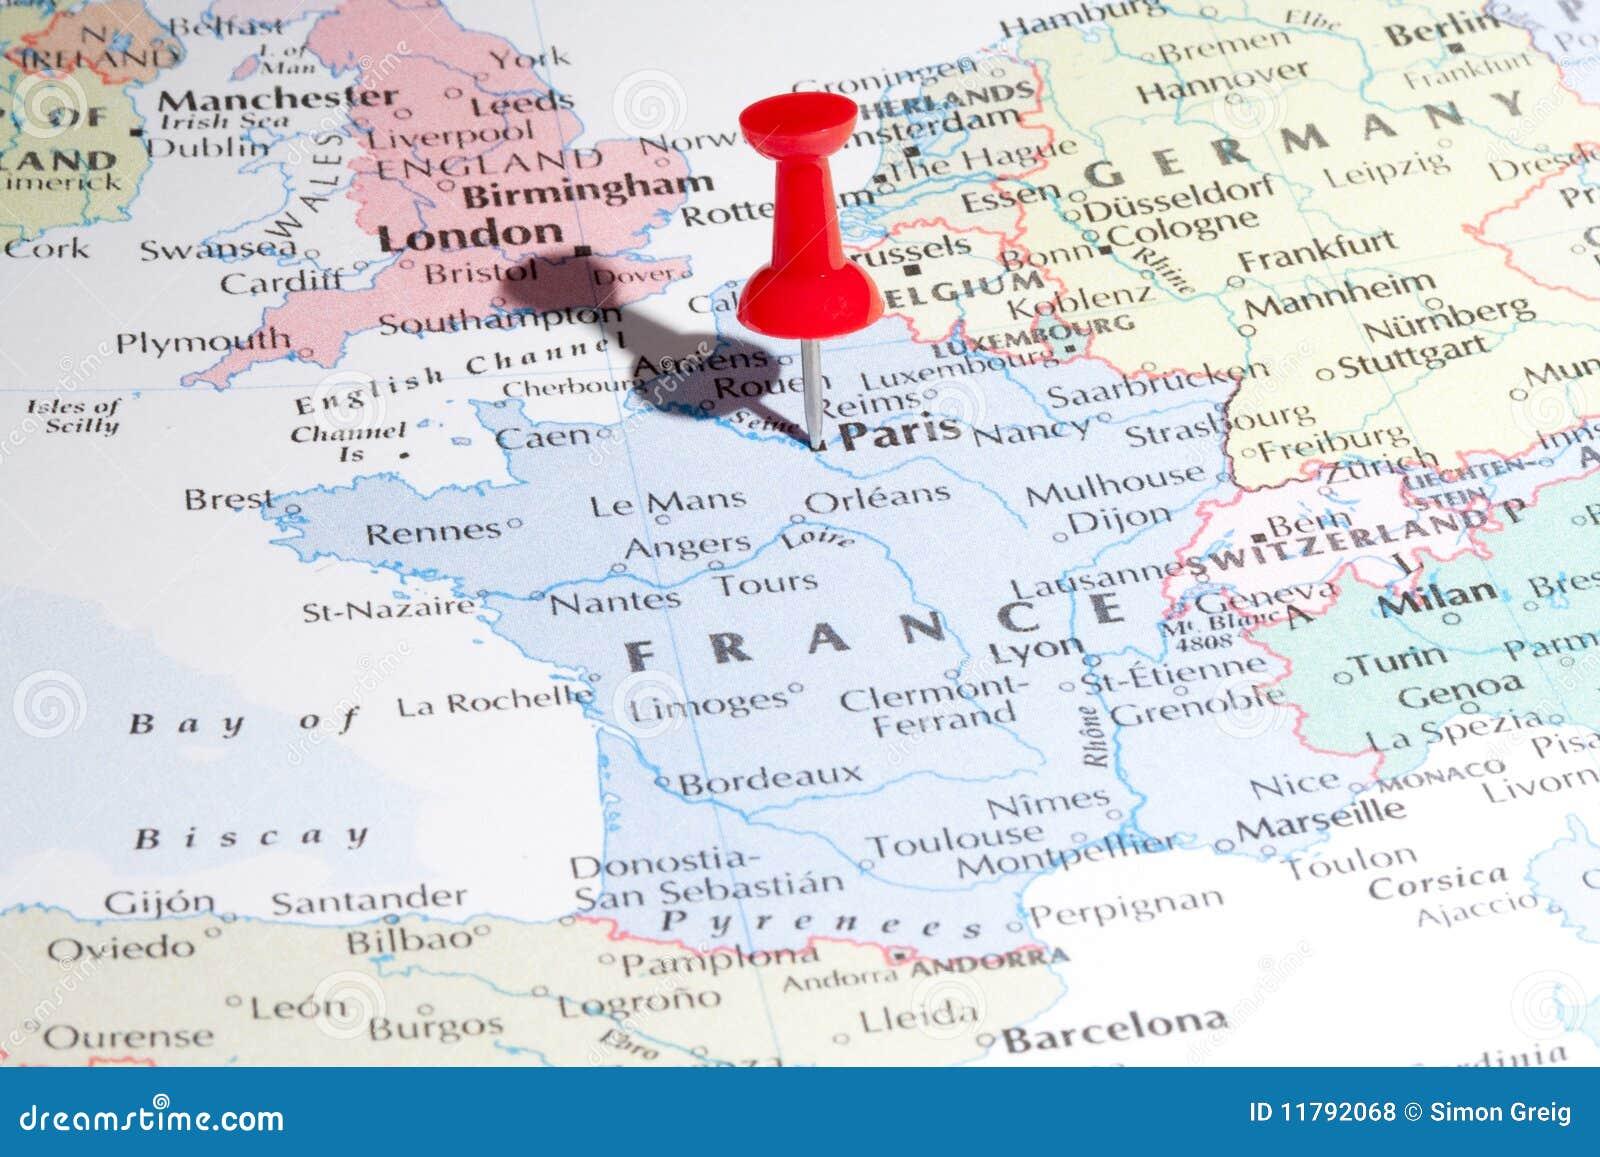 Paris Map Pin Stock Photo Image Of City Travel Destination 11792068